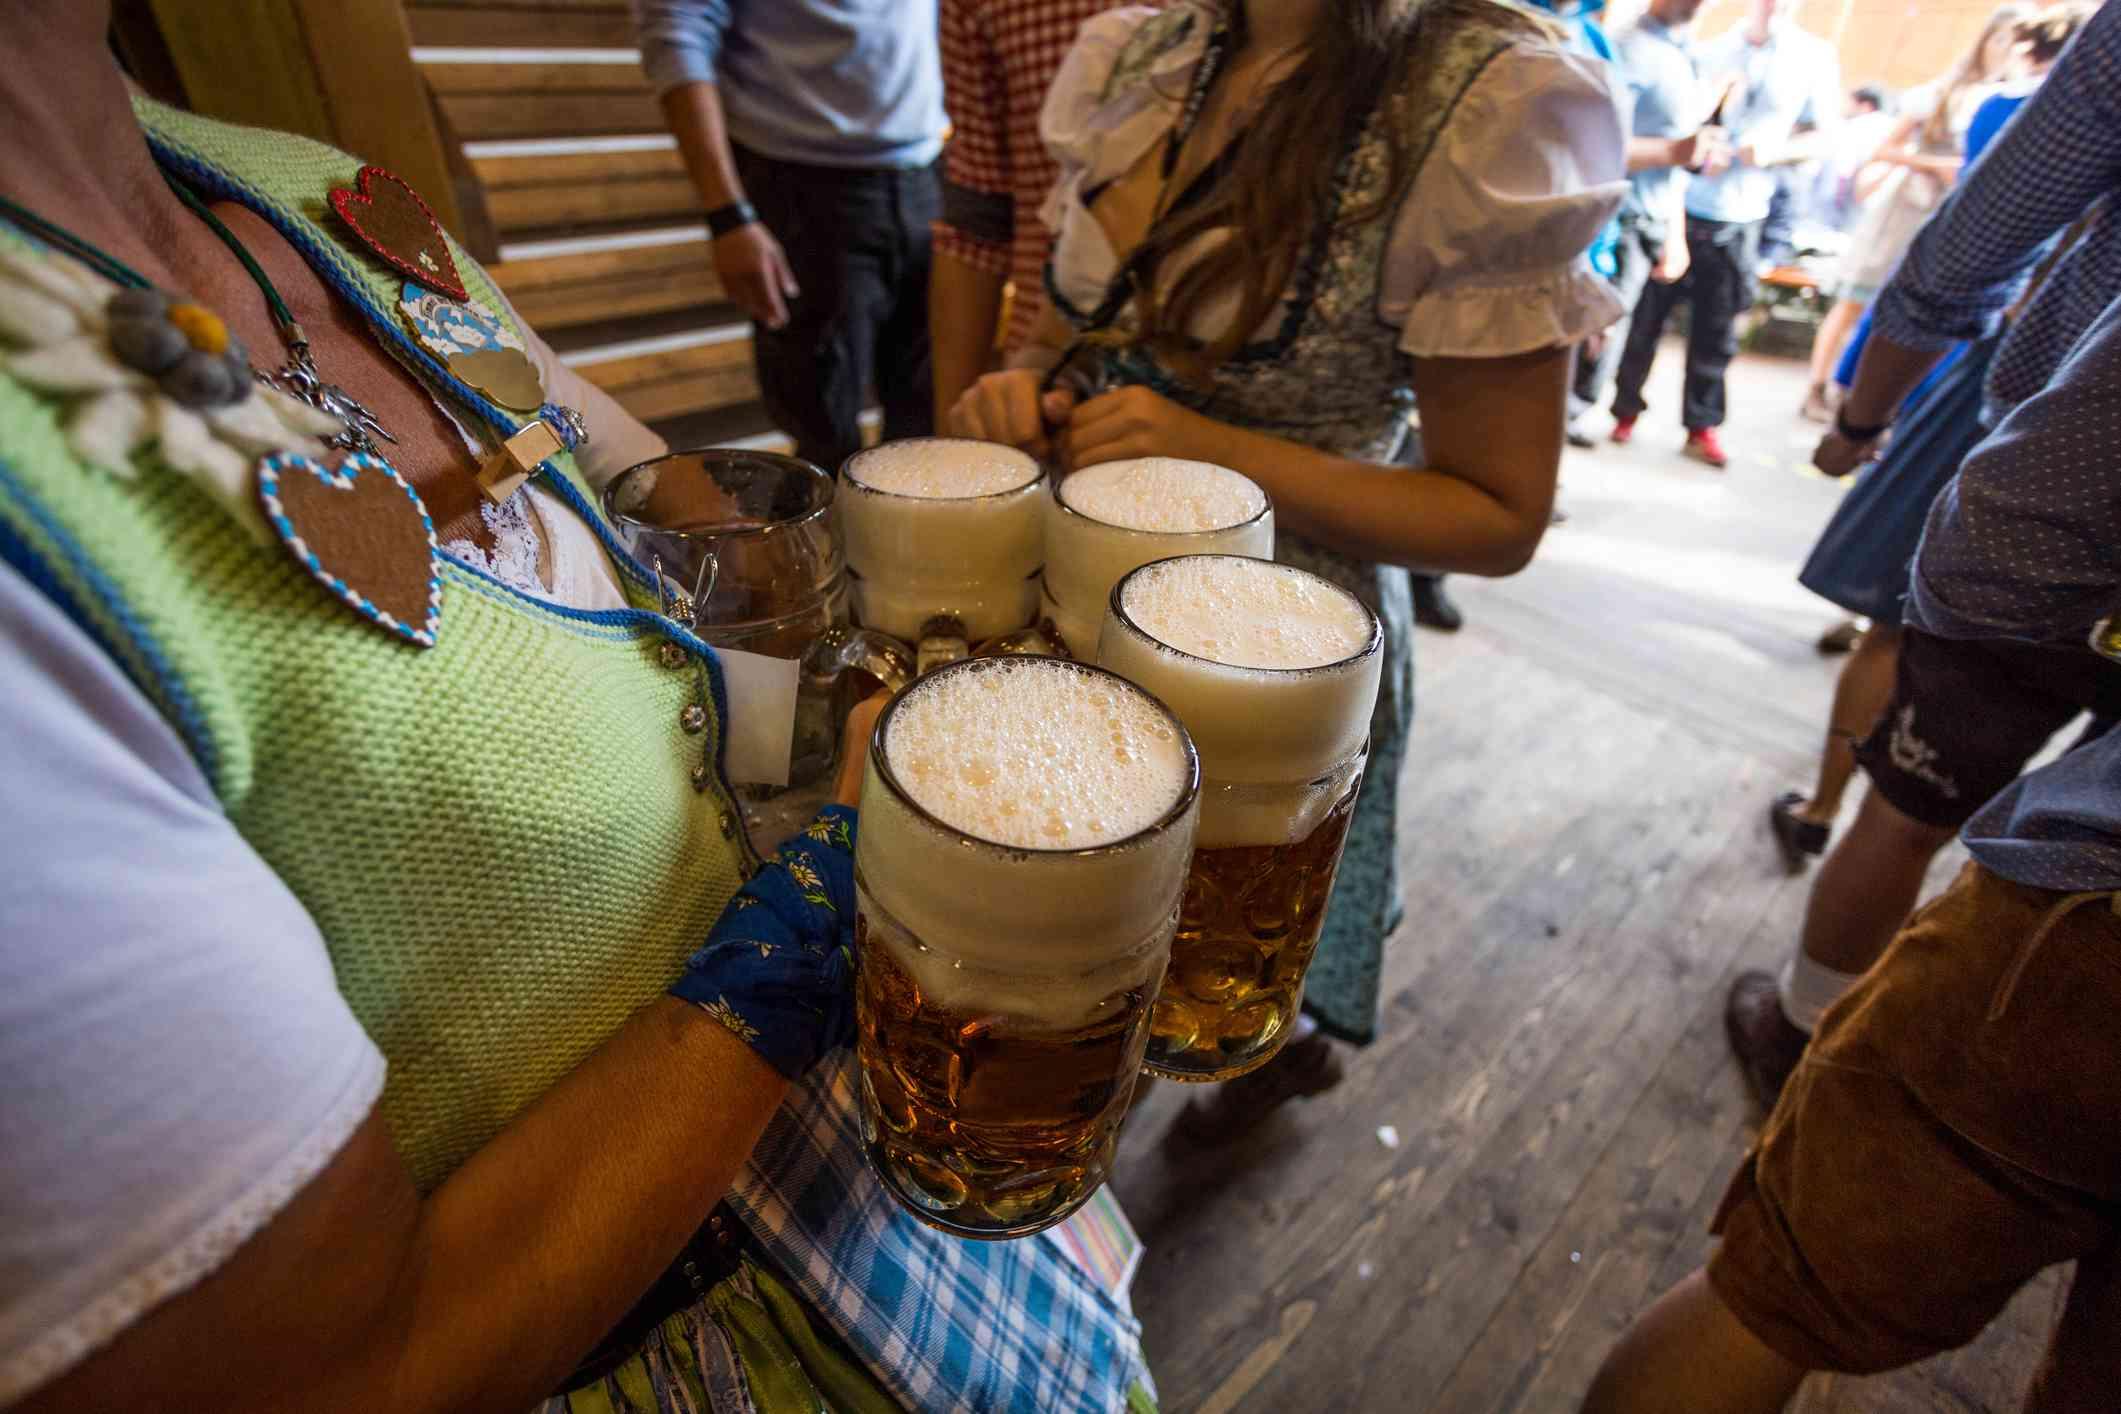 Waitresses serving beer at bar for Oktoberfest, Germany